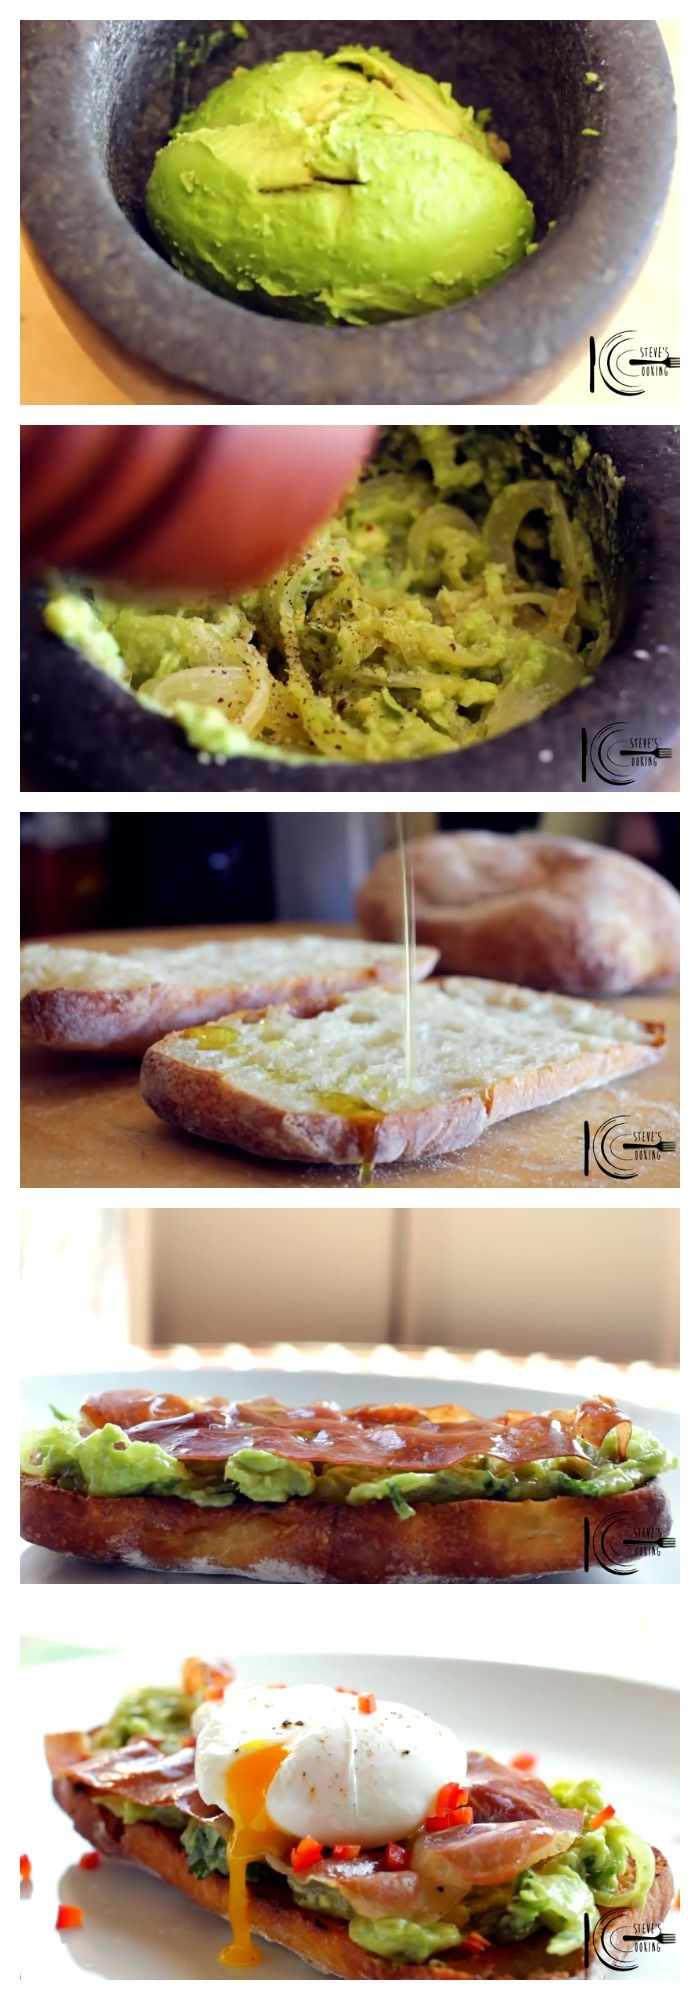 #Avocado Smash, #Prosciutto And Poached #Eggs On Toast